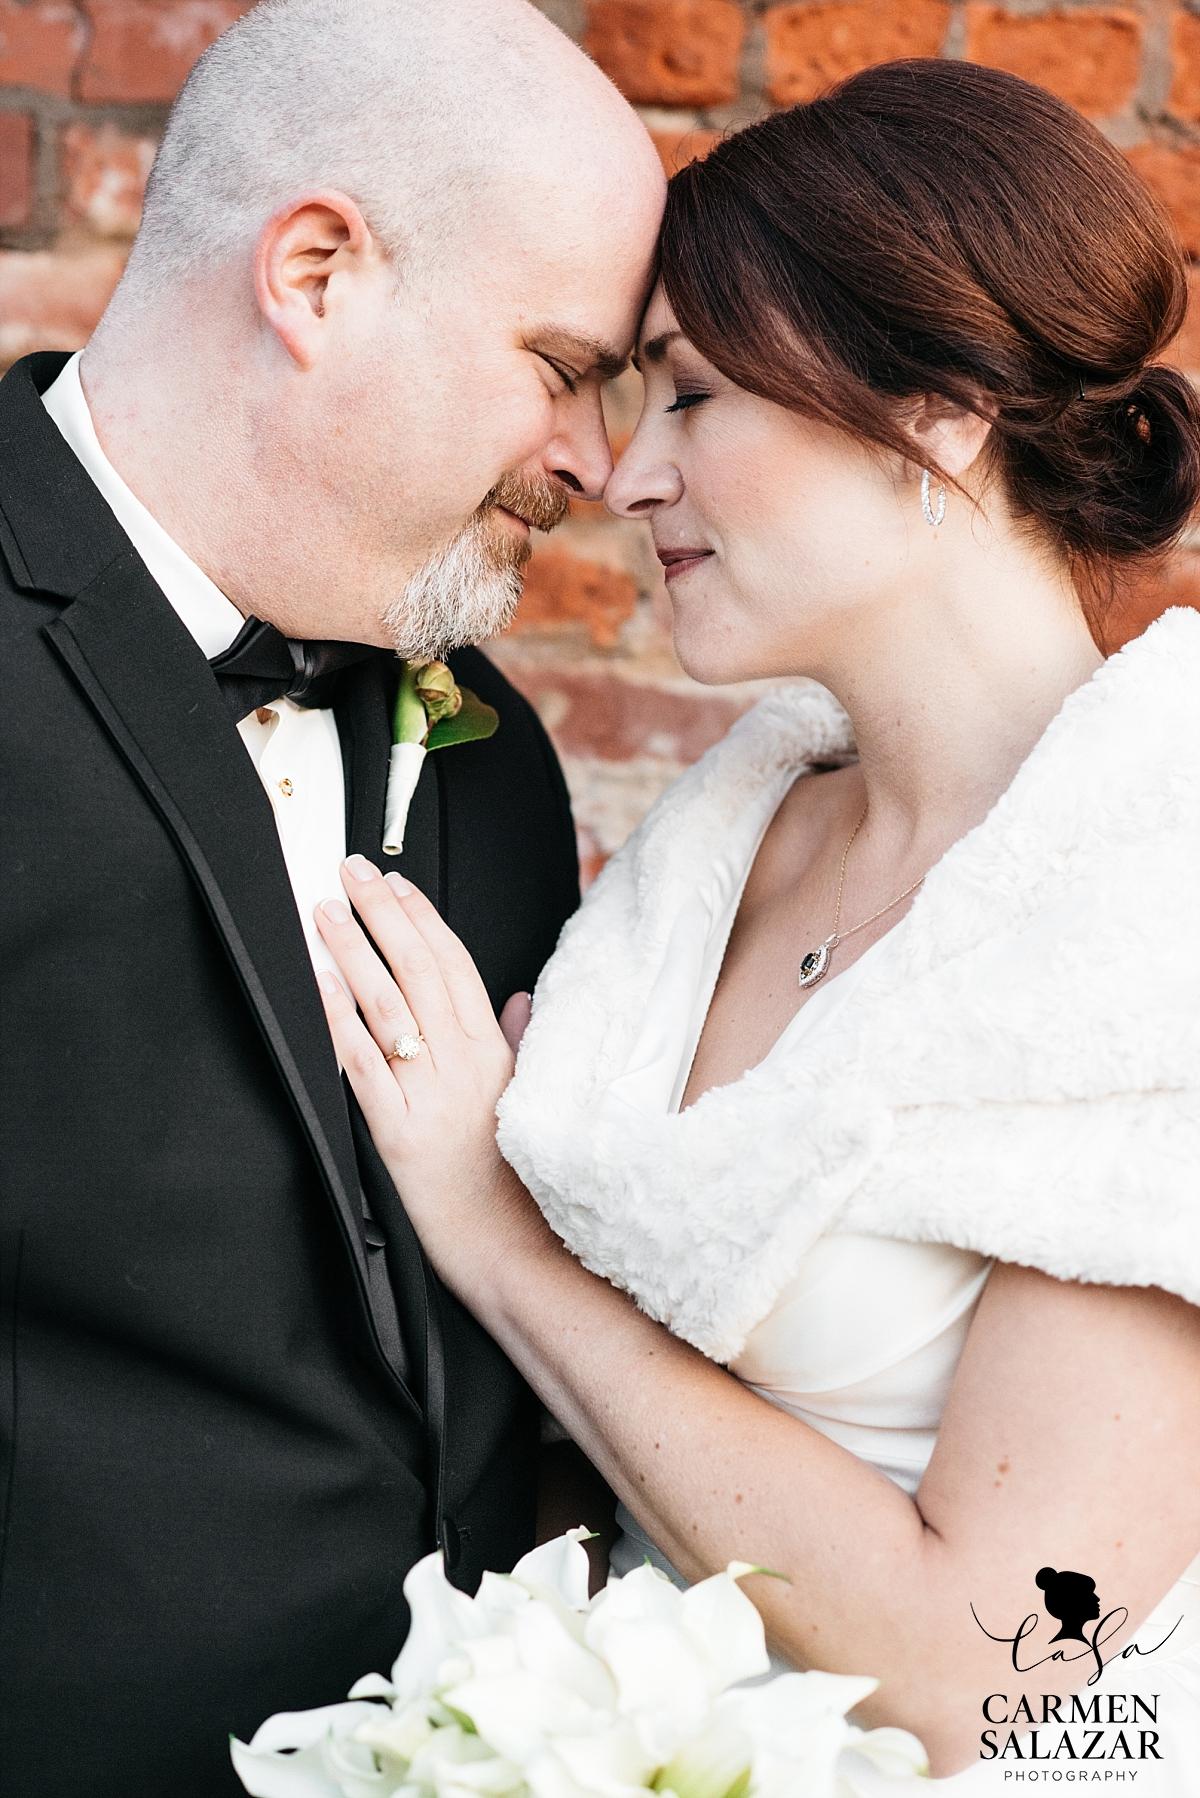 Tender wedding photography in Old Sacramento - Carmen Salazar